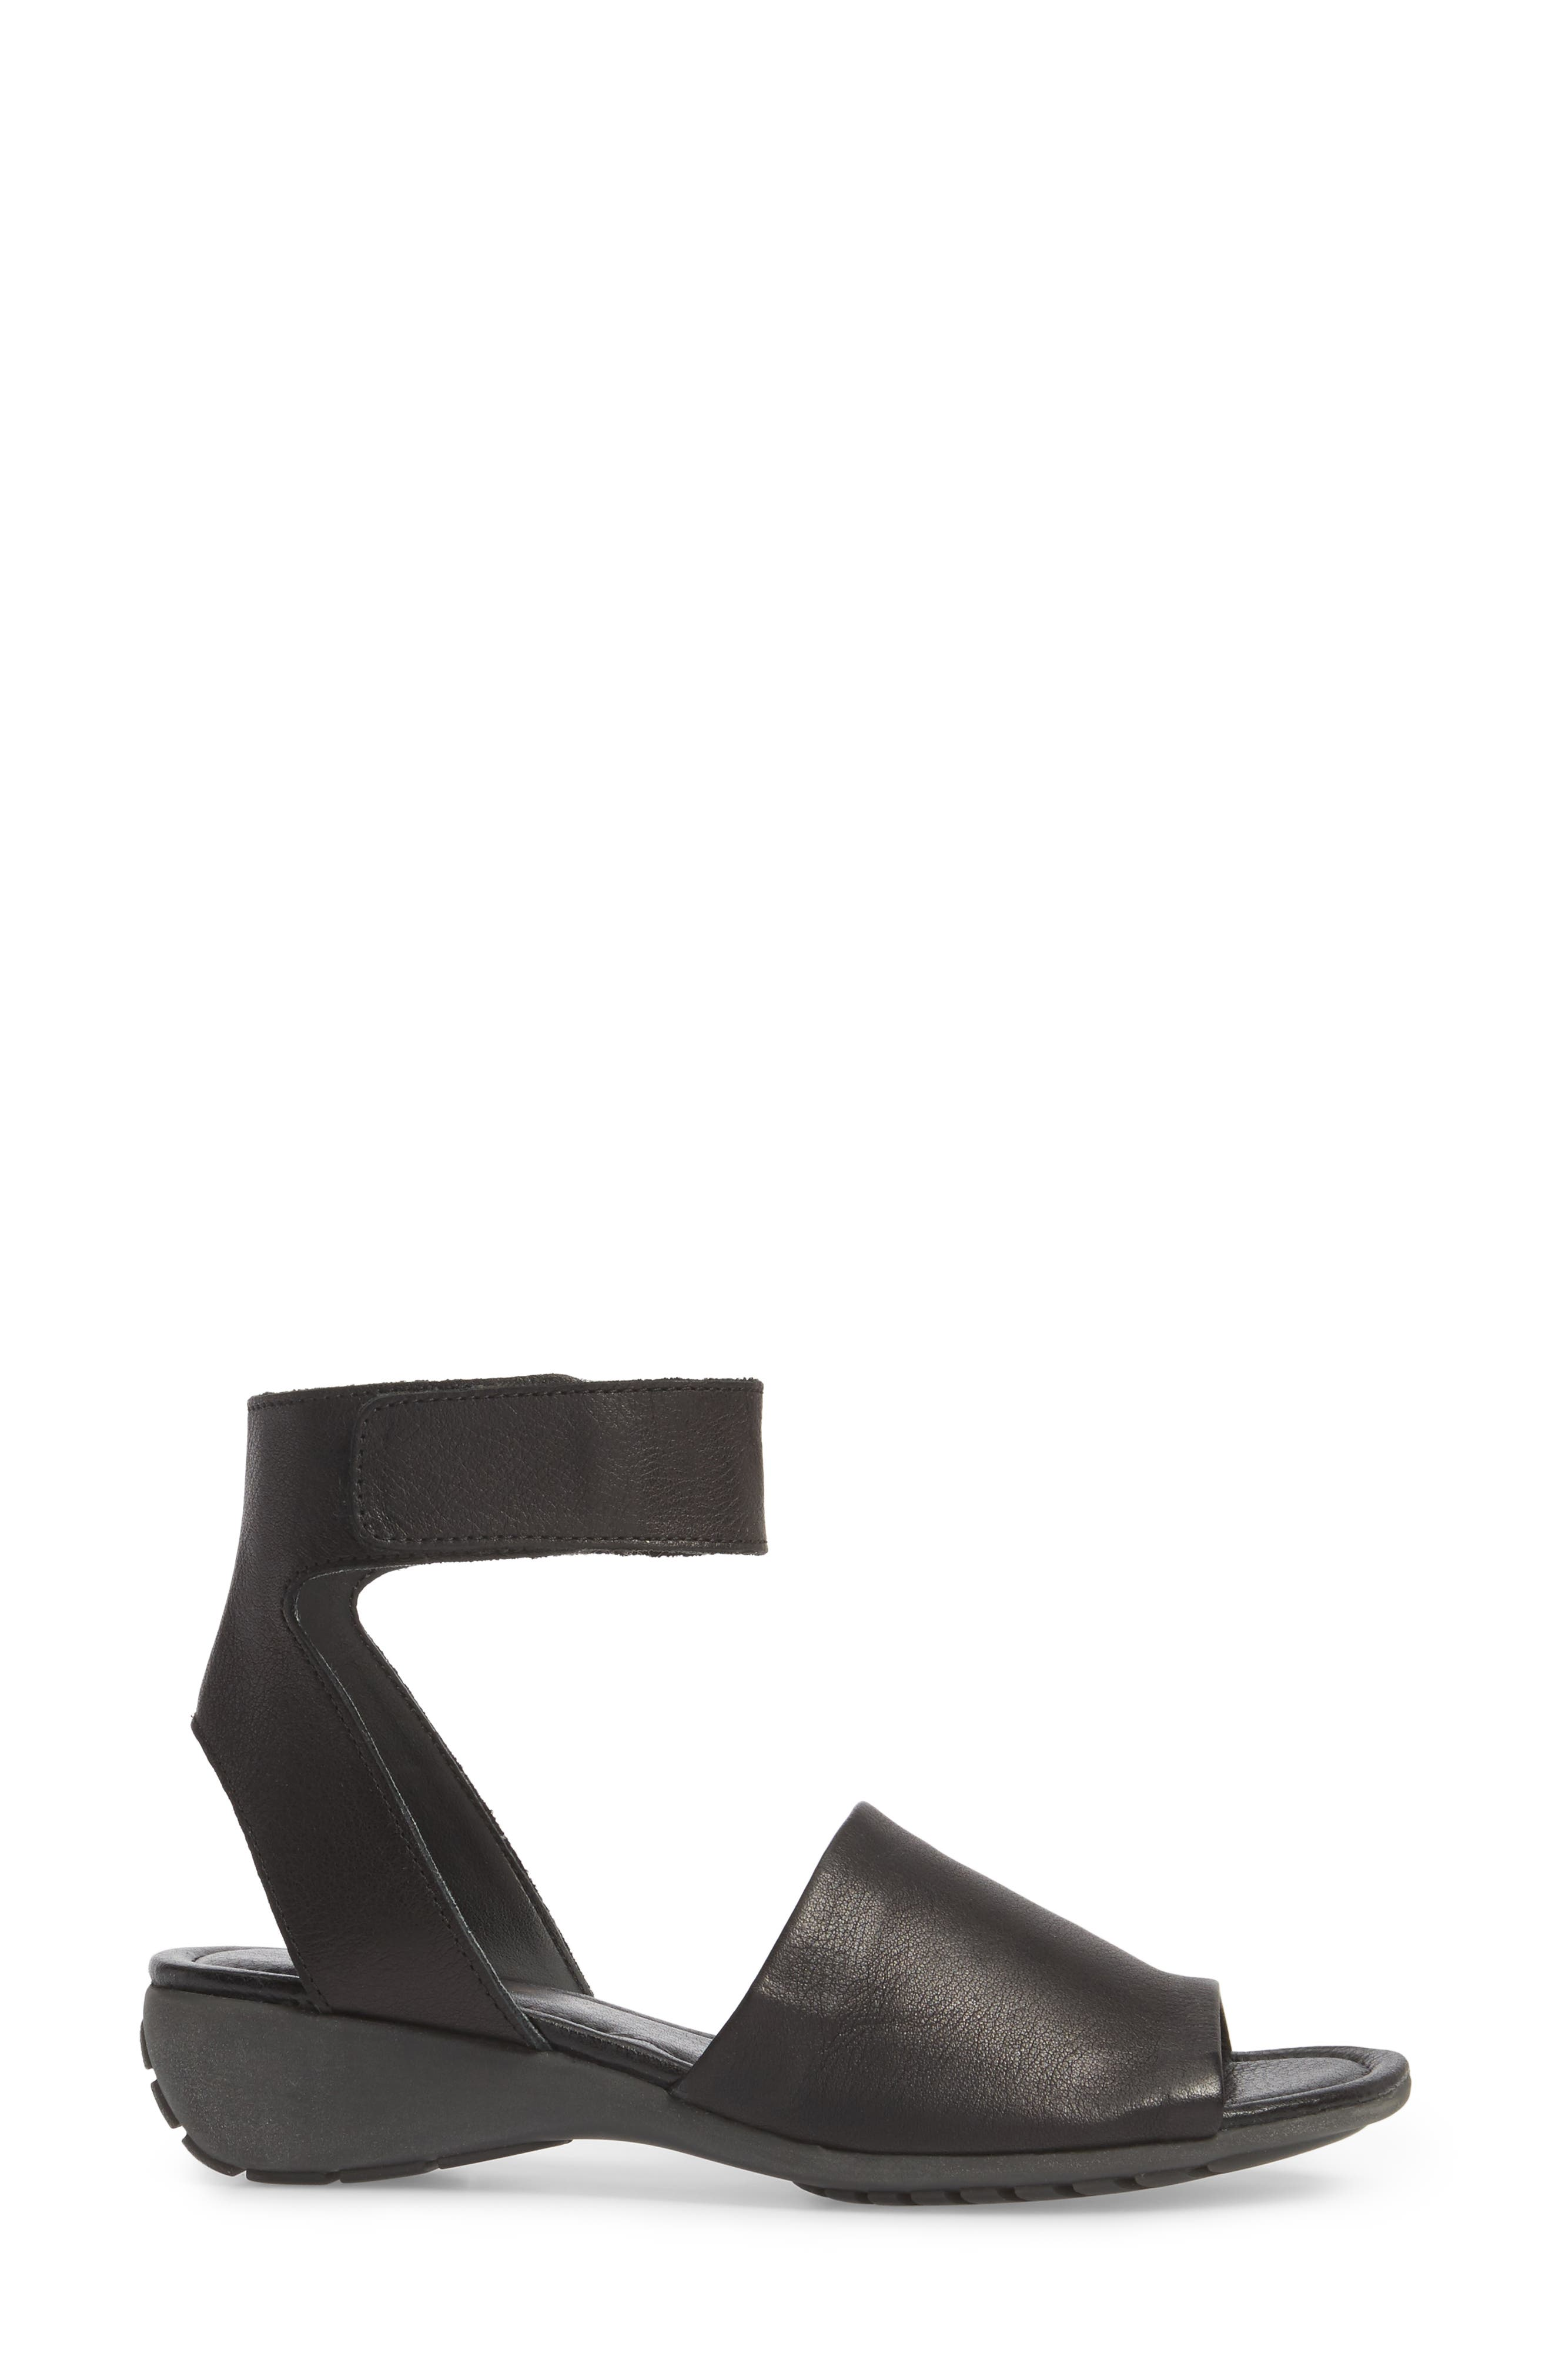 'Beglad' Leather Ankle Strap Sandal,                             Alternate thumbnail 3, color,                             Black Vachetta Leather